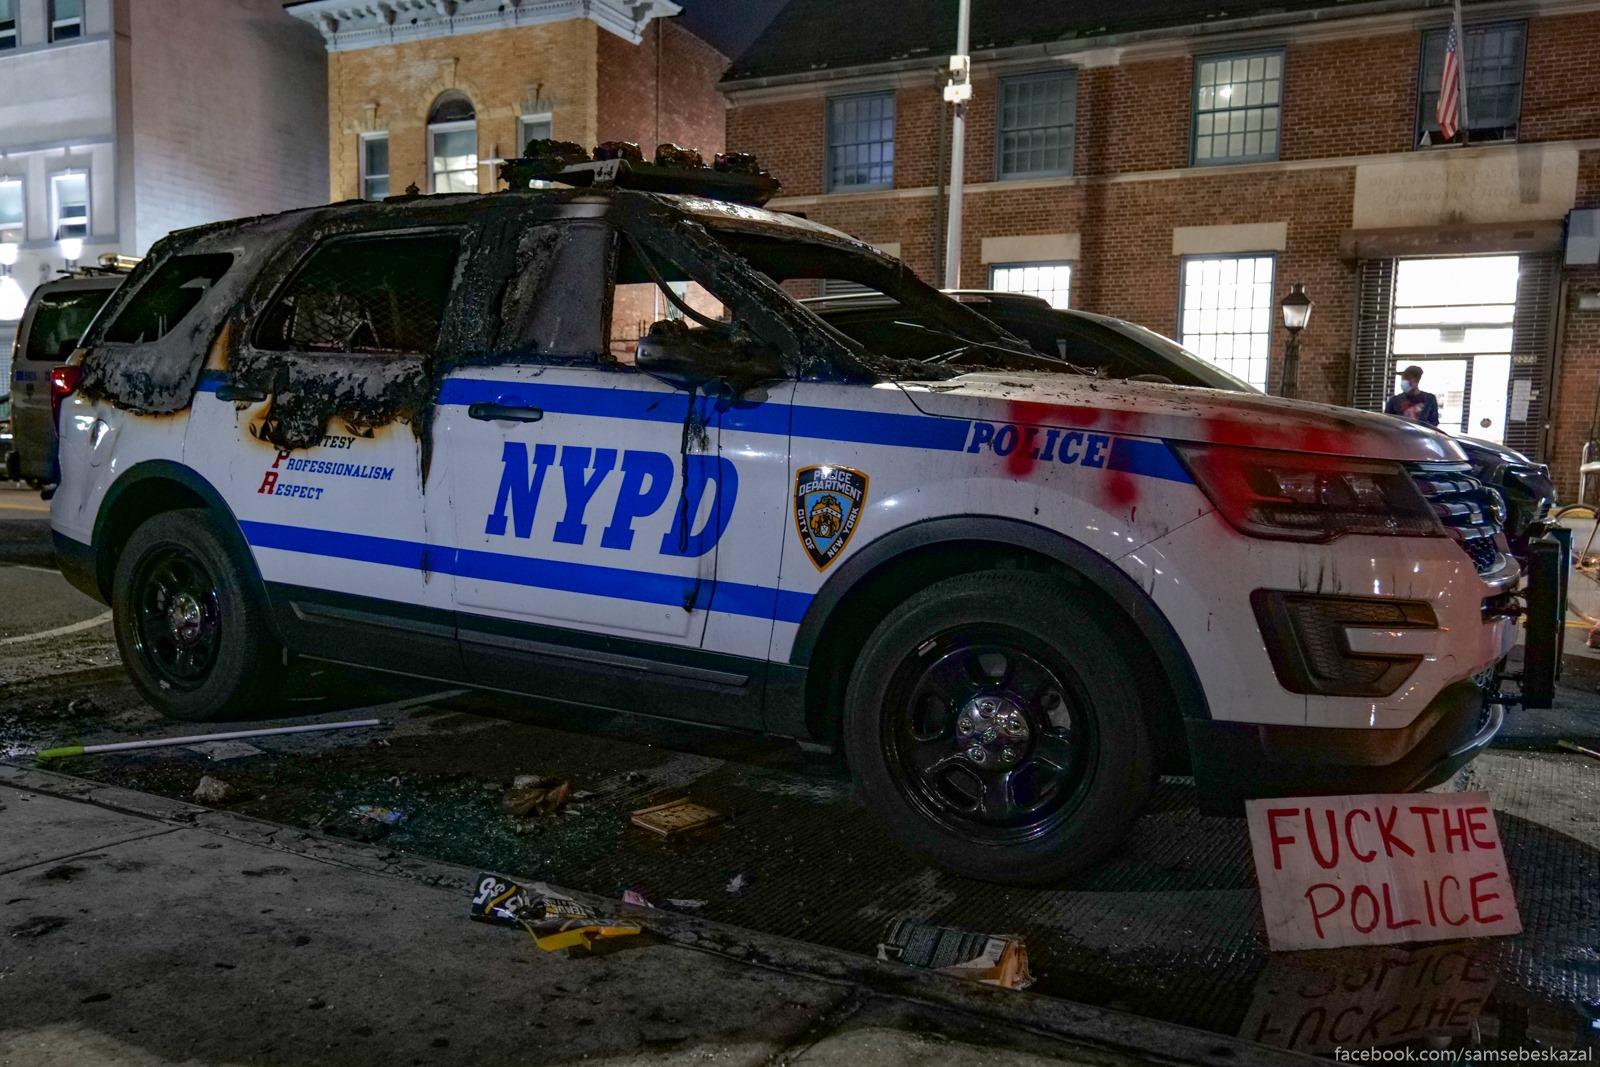 F**k tht police. Novenʹkaa...